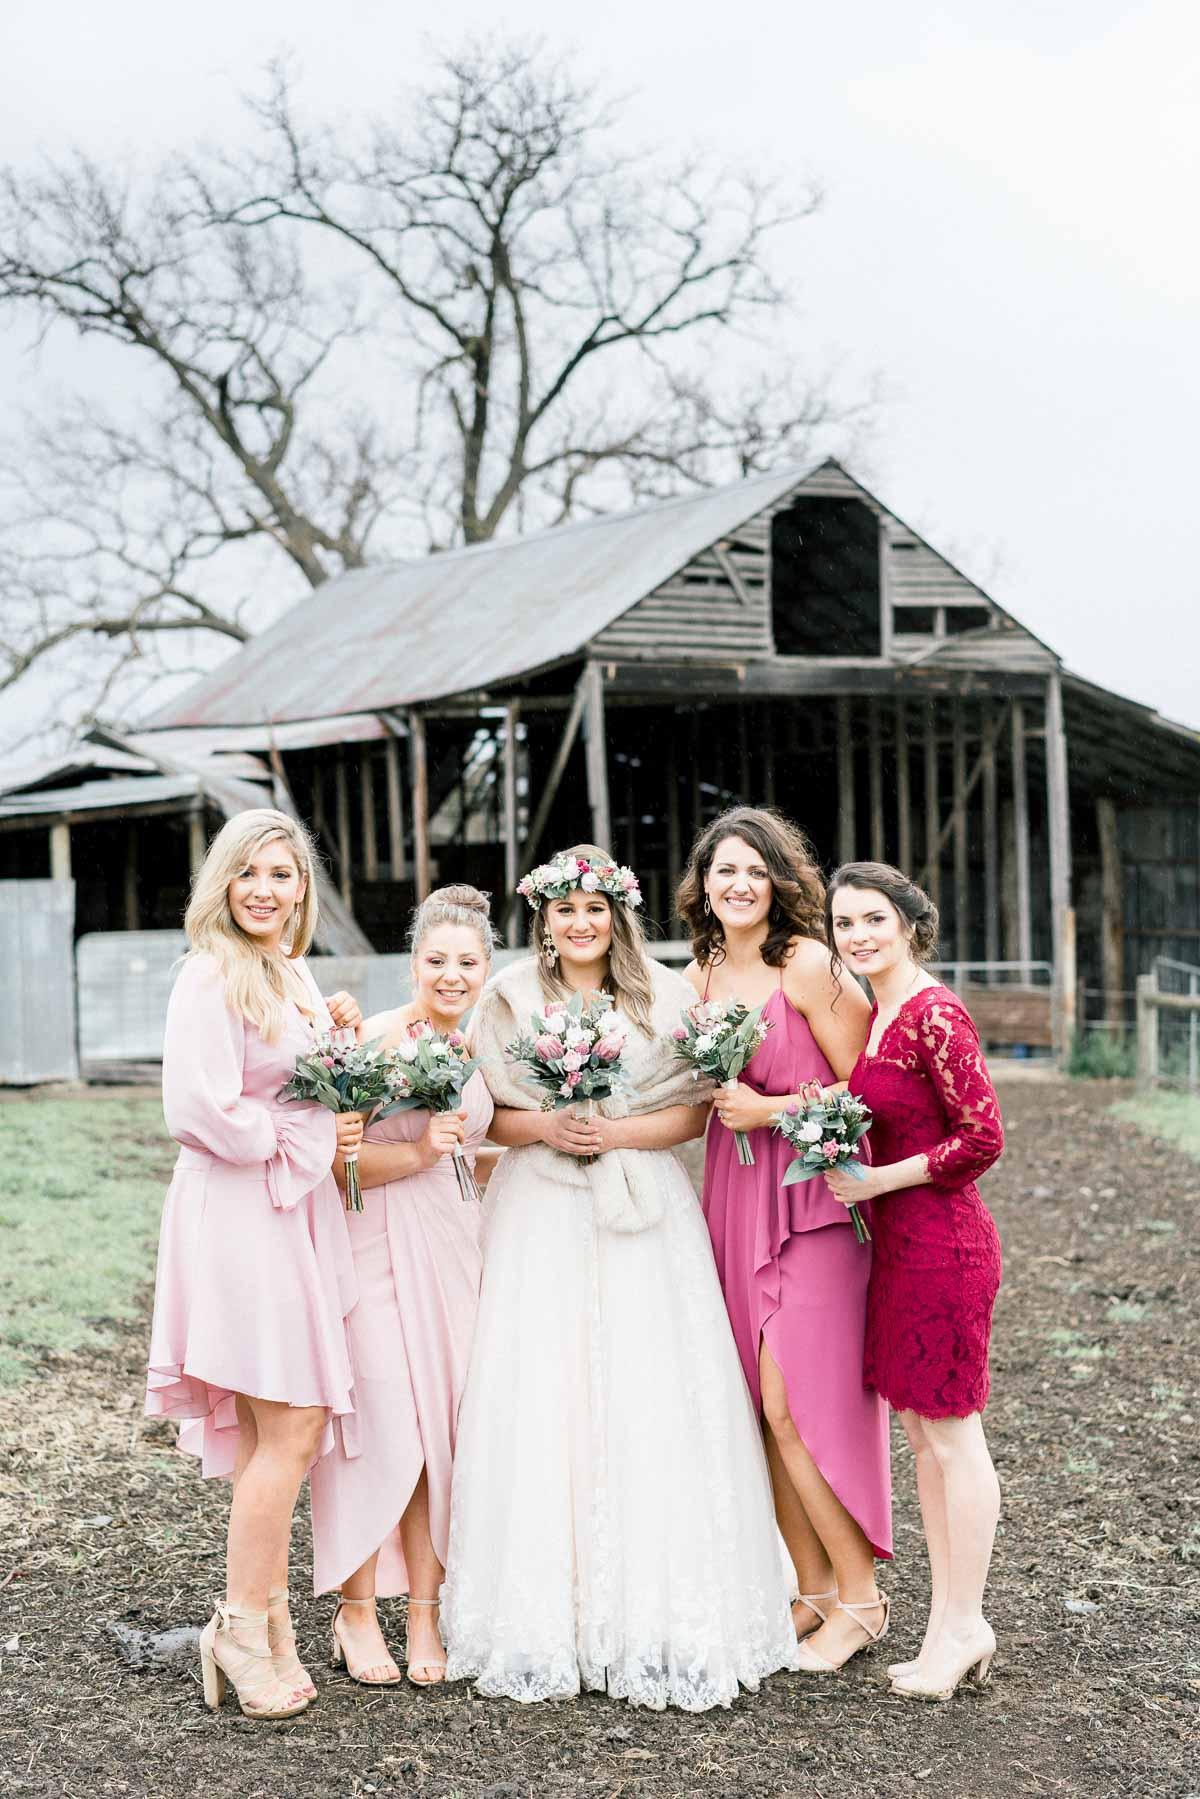 adams-farm-coldstream-yarra-valley-wedding-heart+soul-weddings-kel-jarryd-05683.jpg